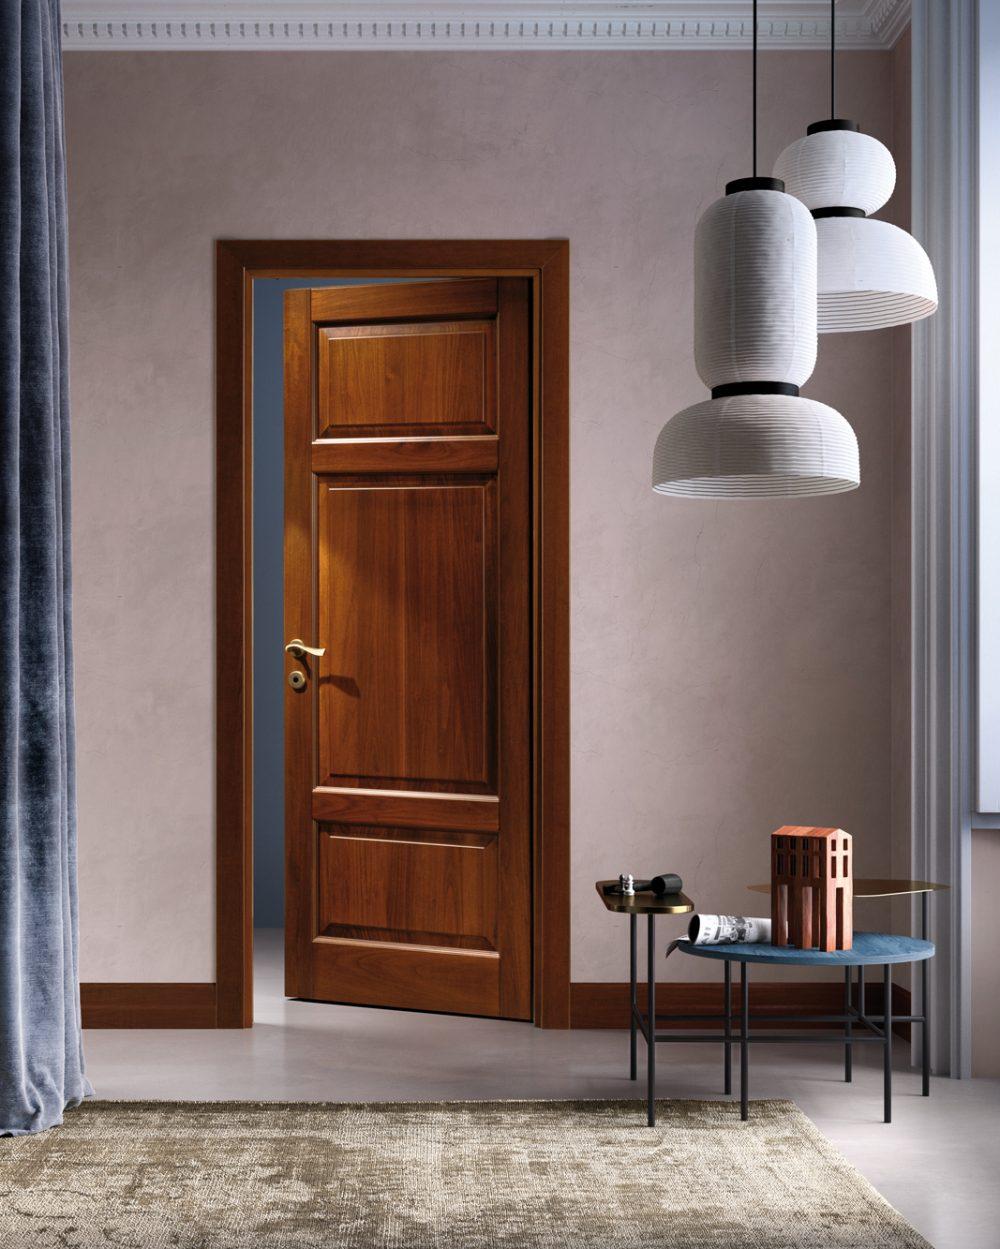 Porta in legno arte povera - Garofoli